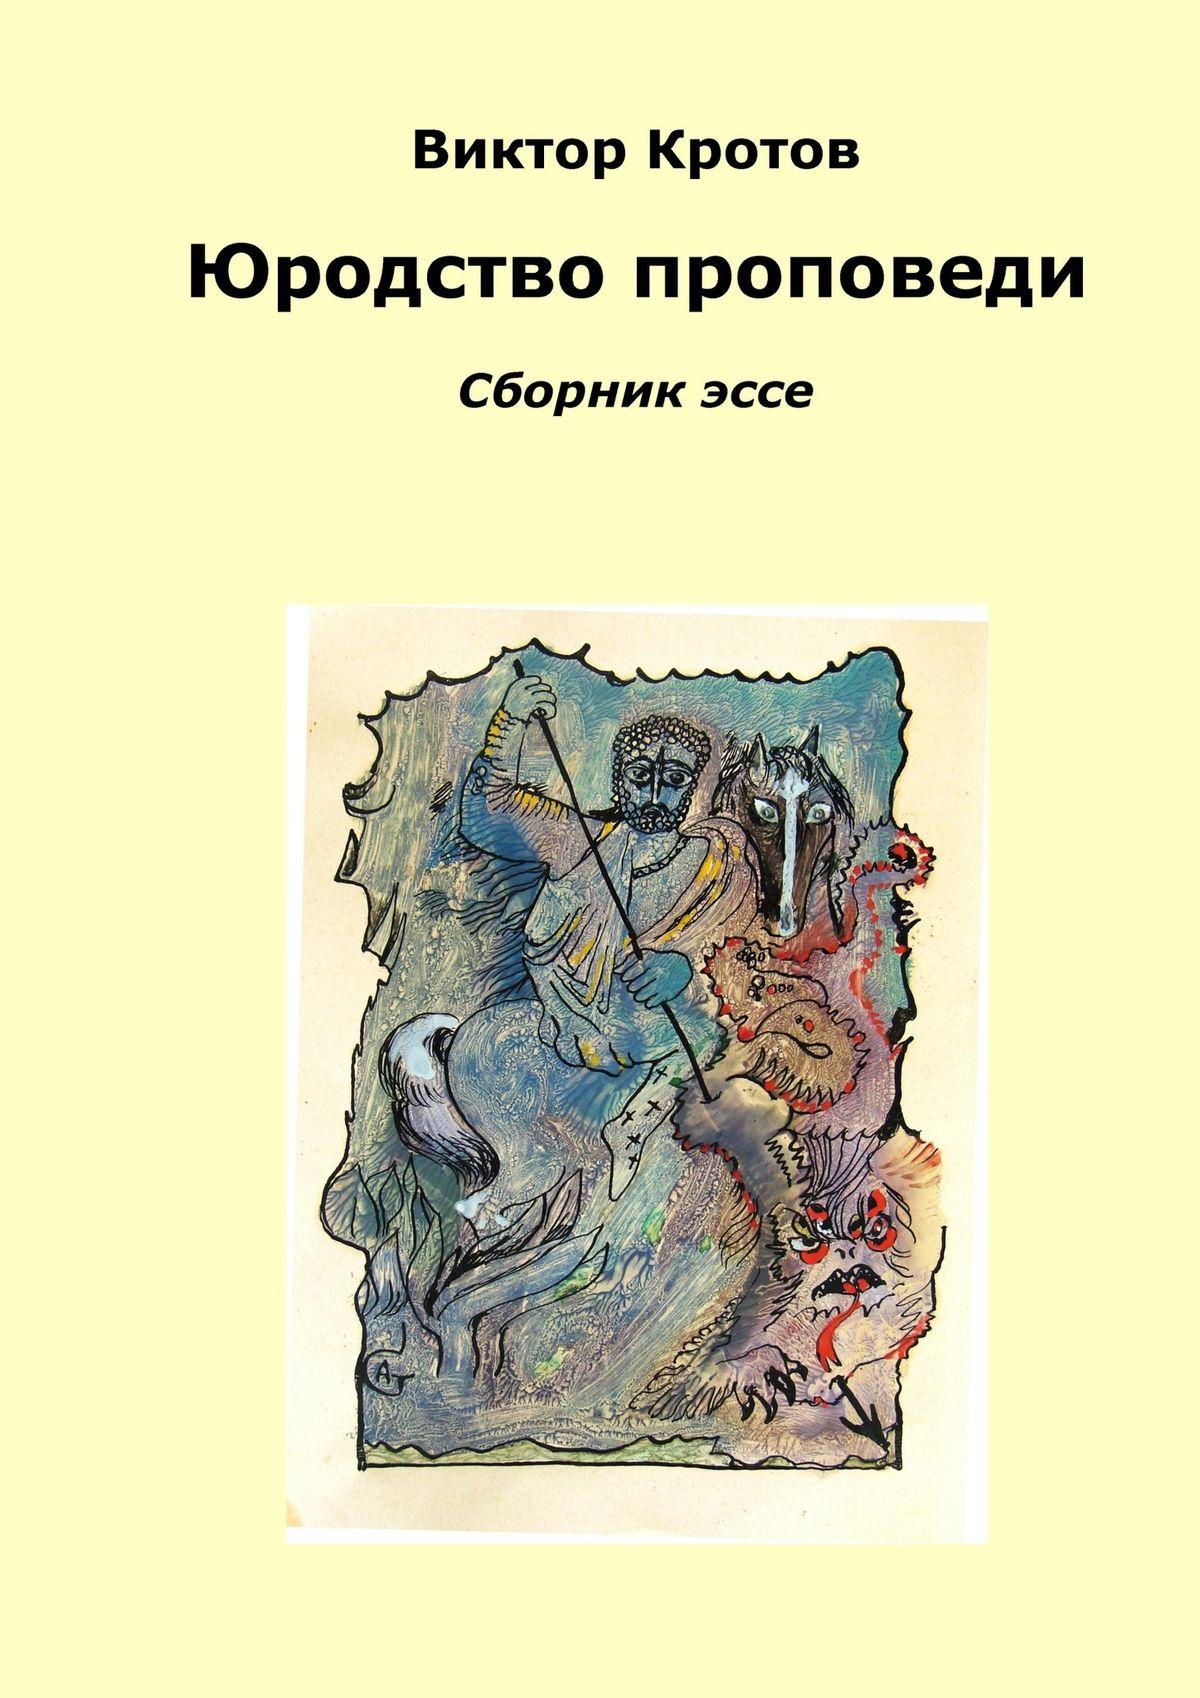 Виктор Гаврилович Кротов Юродство проповеди. Сборник эссе